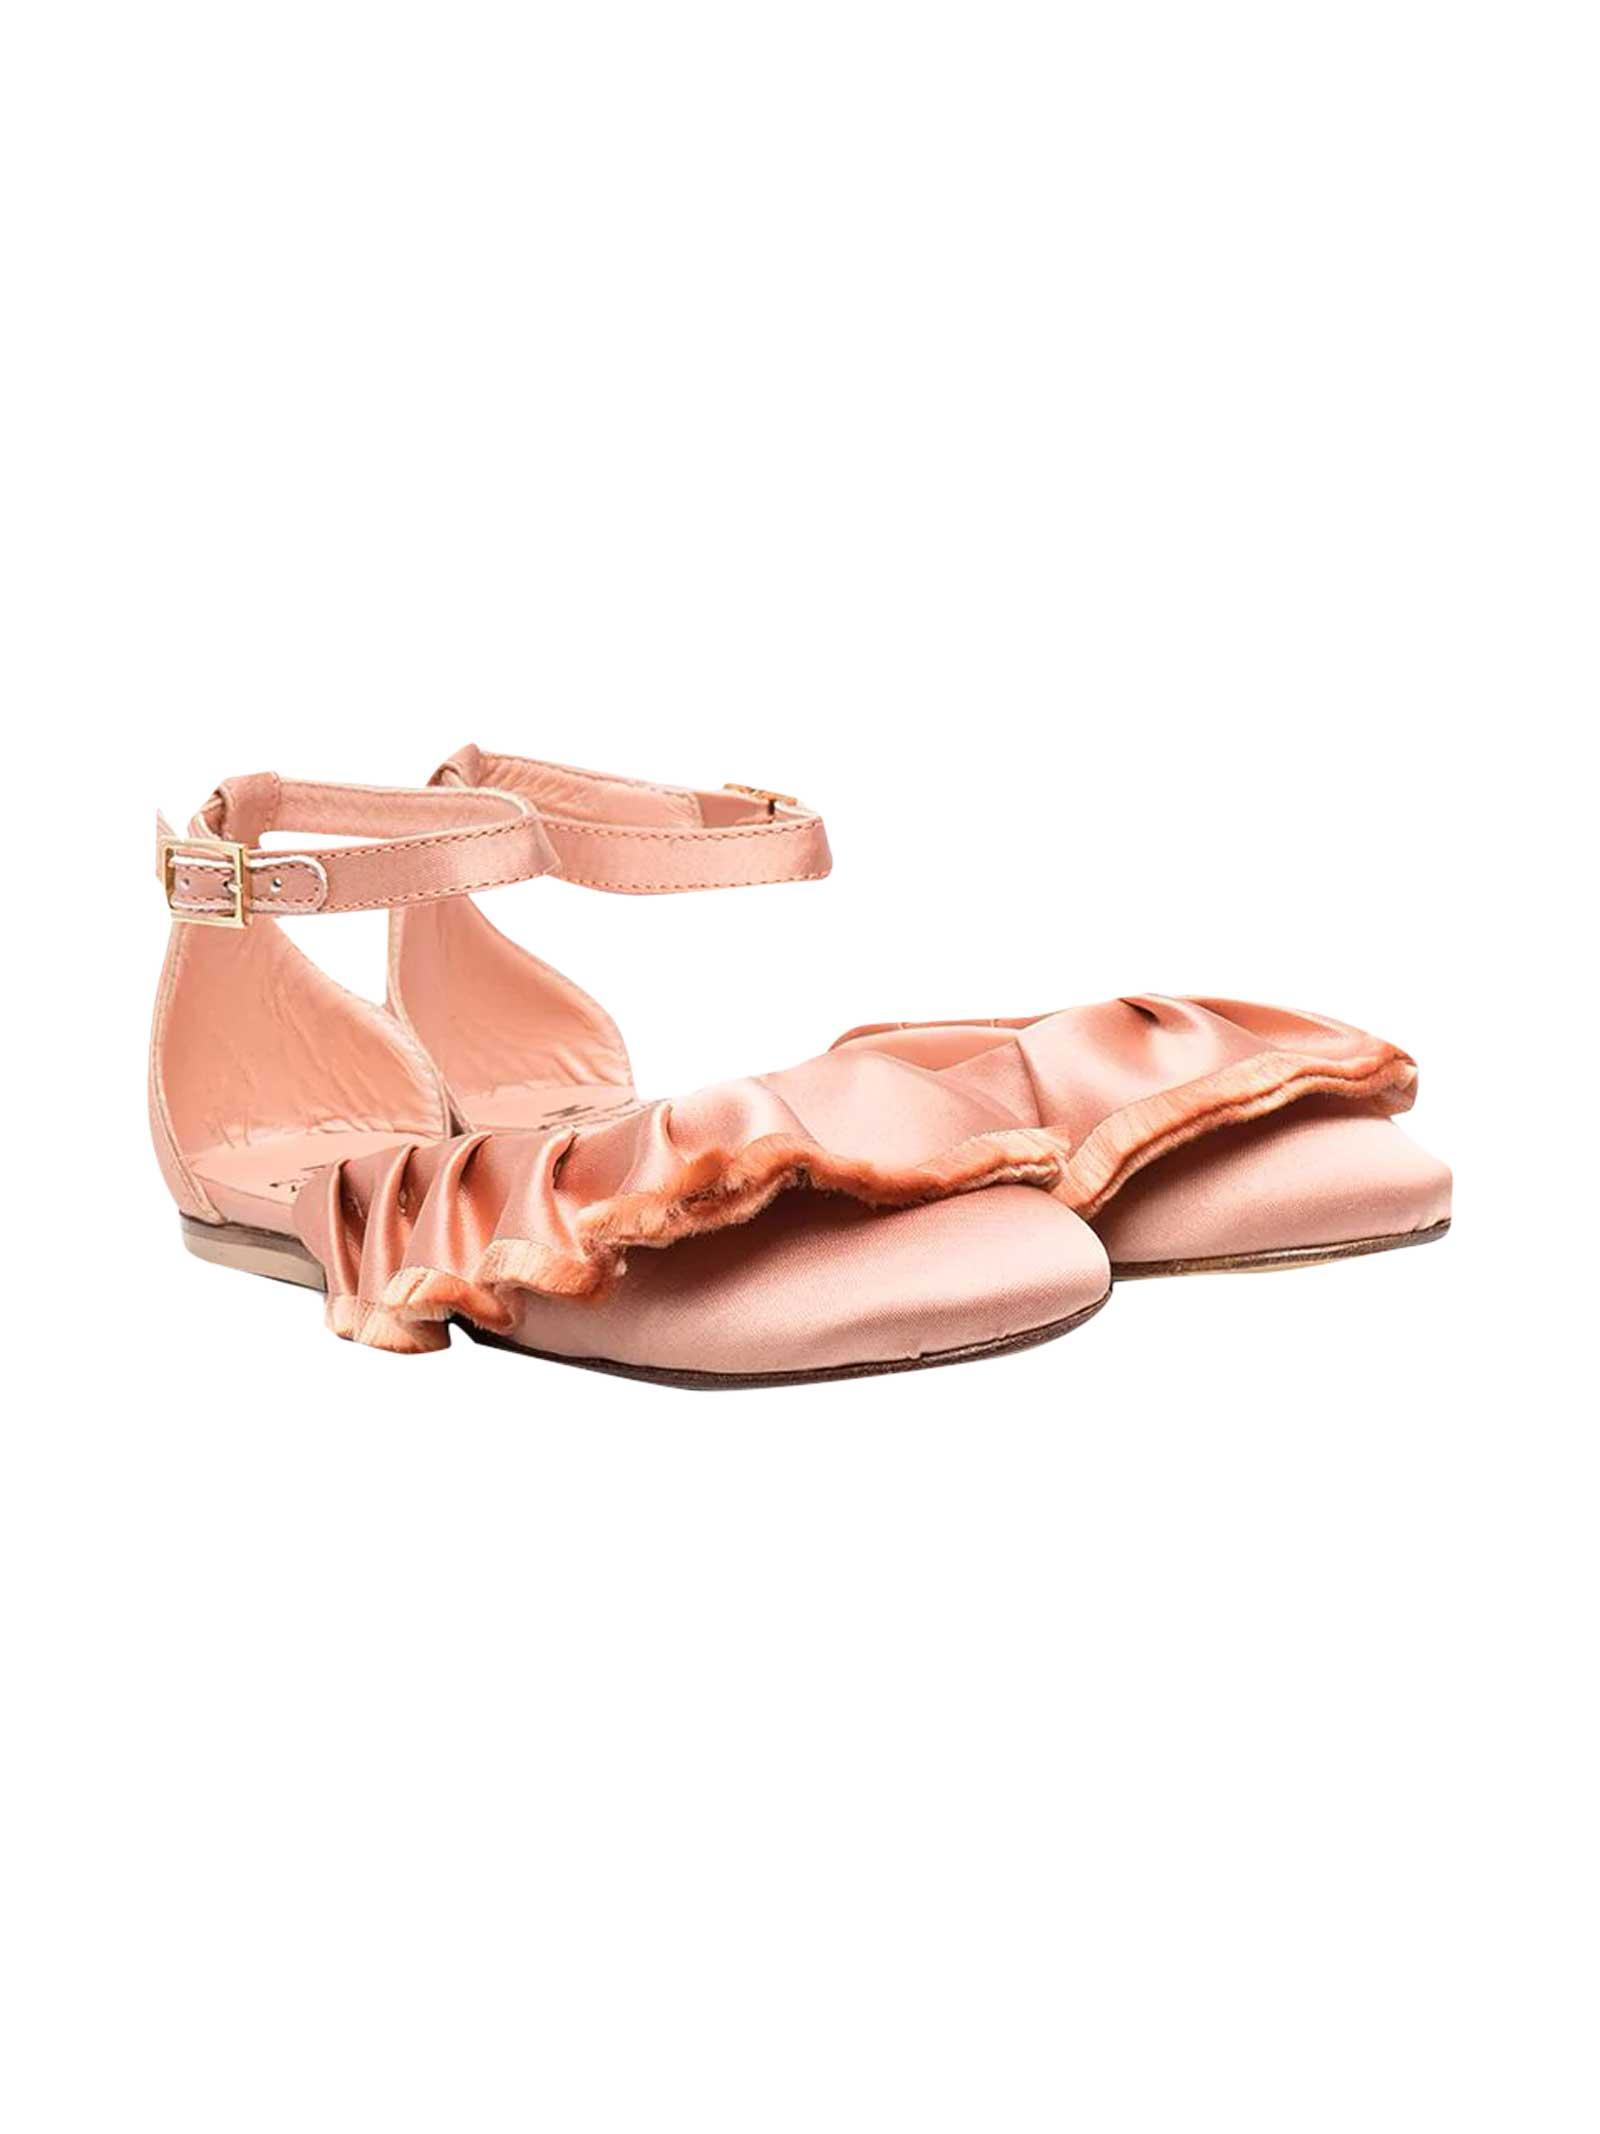 Ballet Flats With Ruffles Elisabetta Franchi My Child